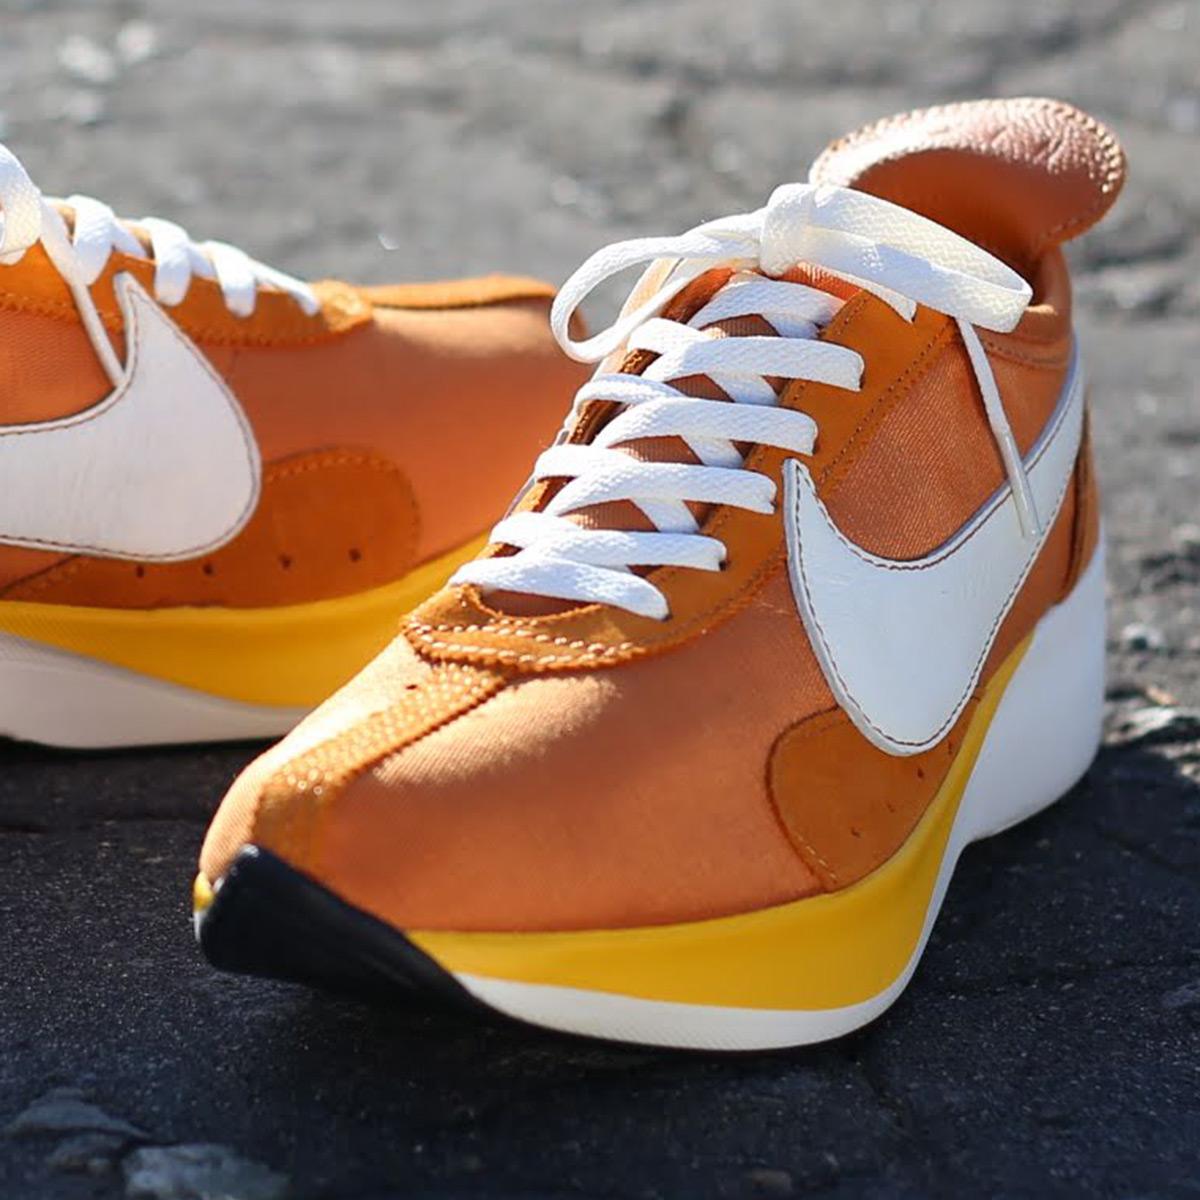 new product 14631 22421 NIKE MOON RACER QS (Nike moon racer QS) (MONARCH SAIL-AMARILLO ...